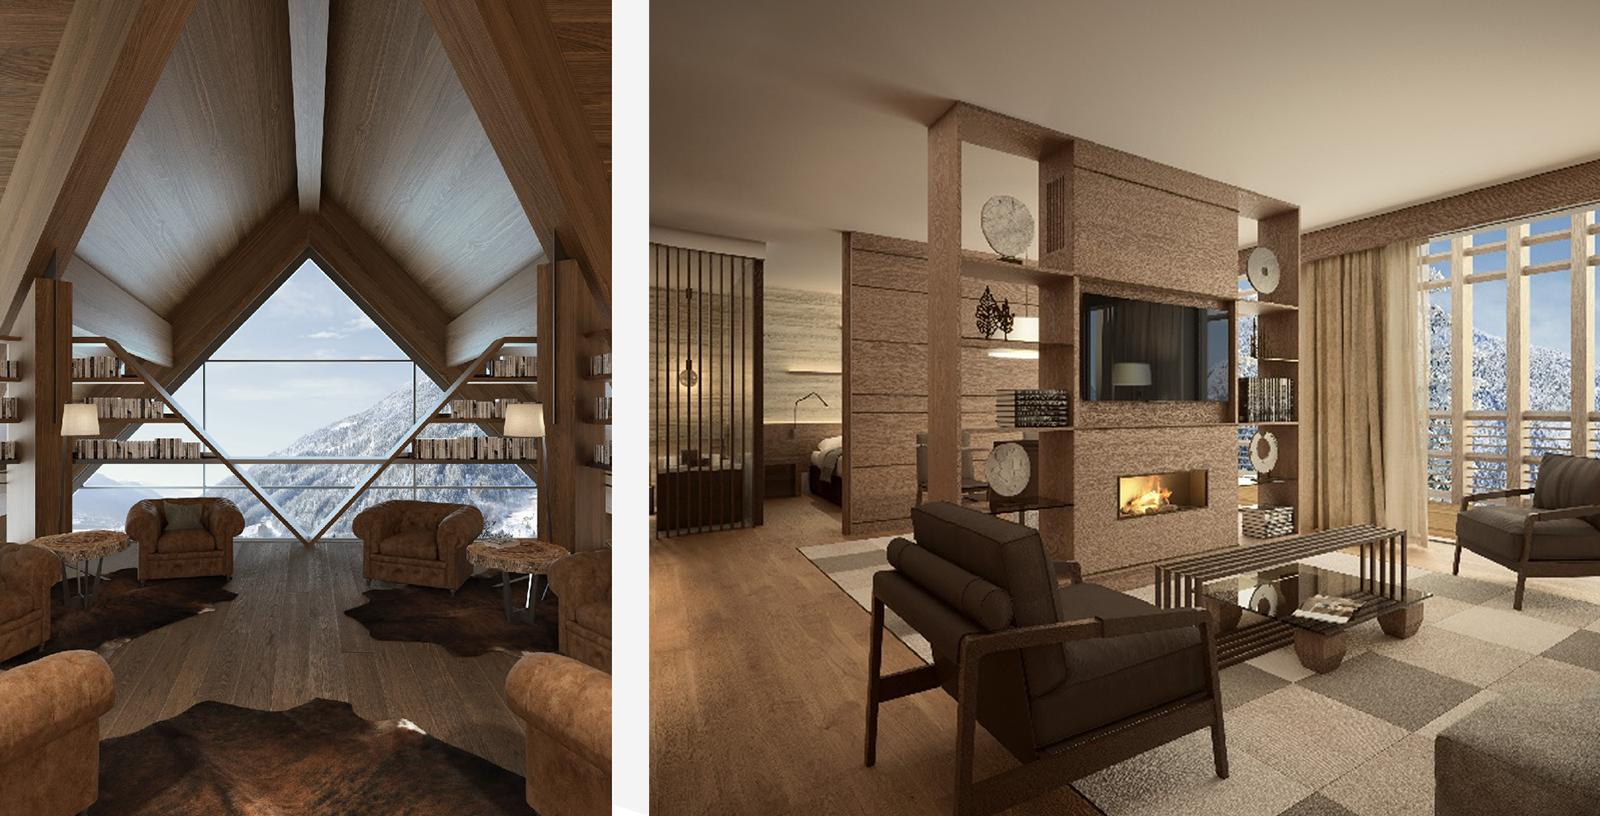 Dolomites wellness retreat, apartments for sale via Engel & Völkers